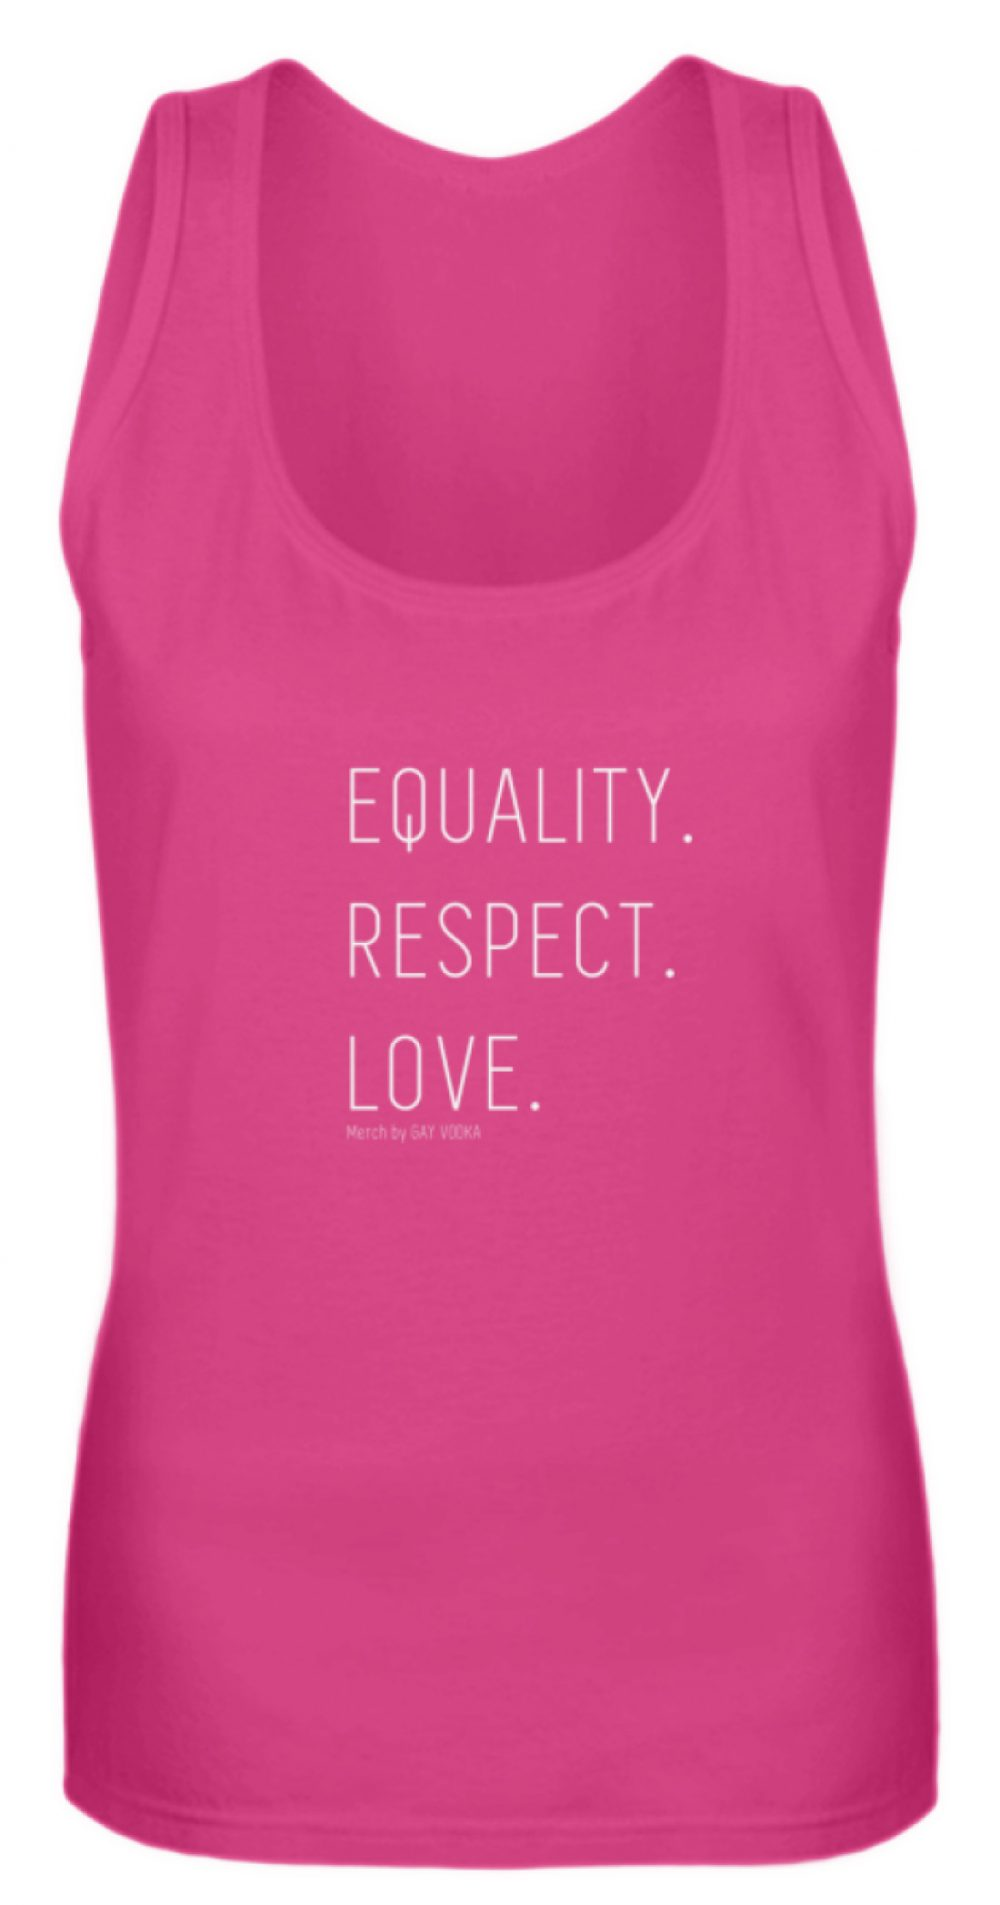 EQUALITY. RESPECT. LOVE. - Frauen Tanktop-28